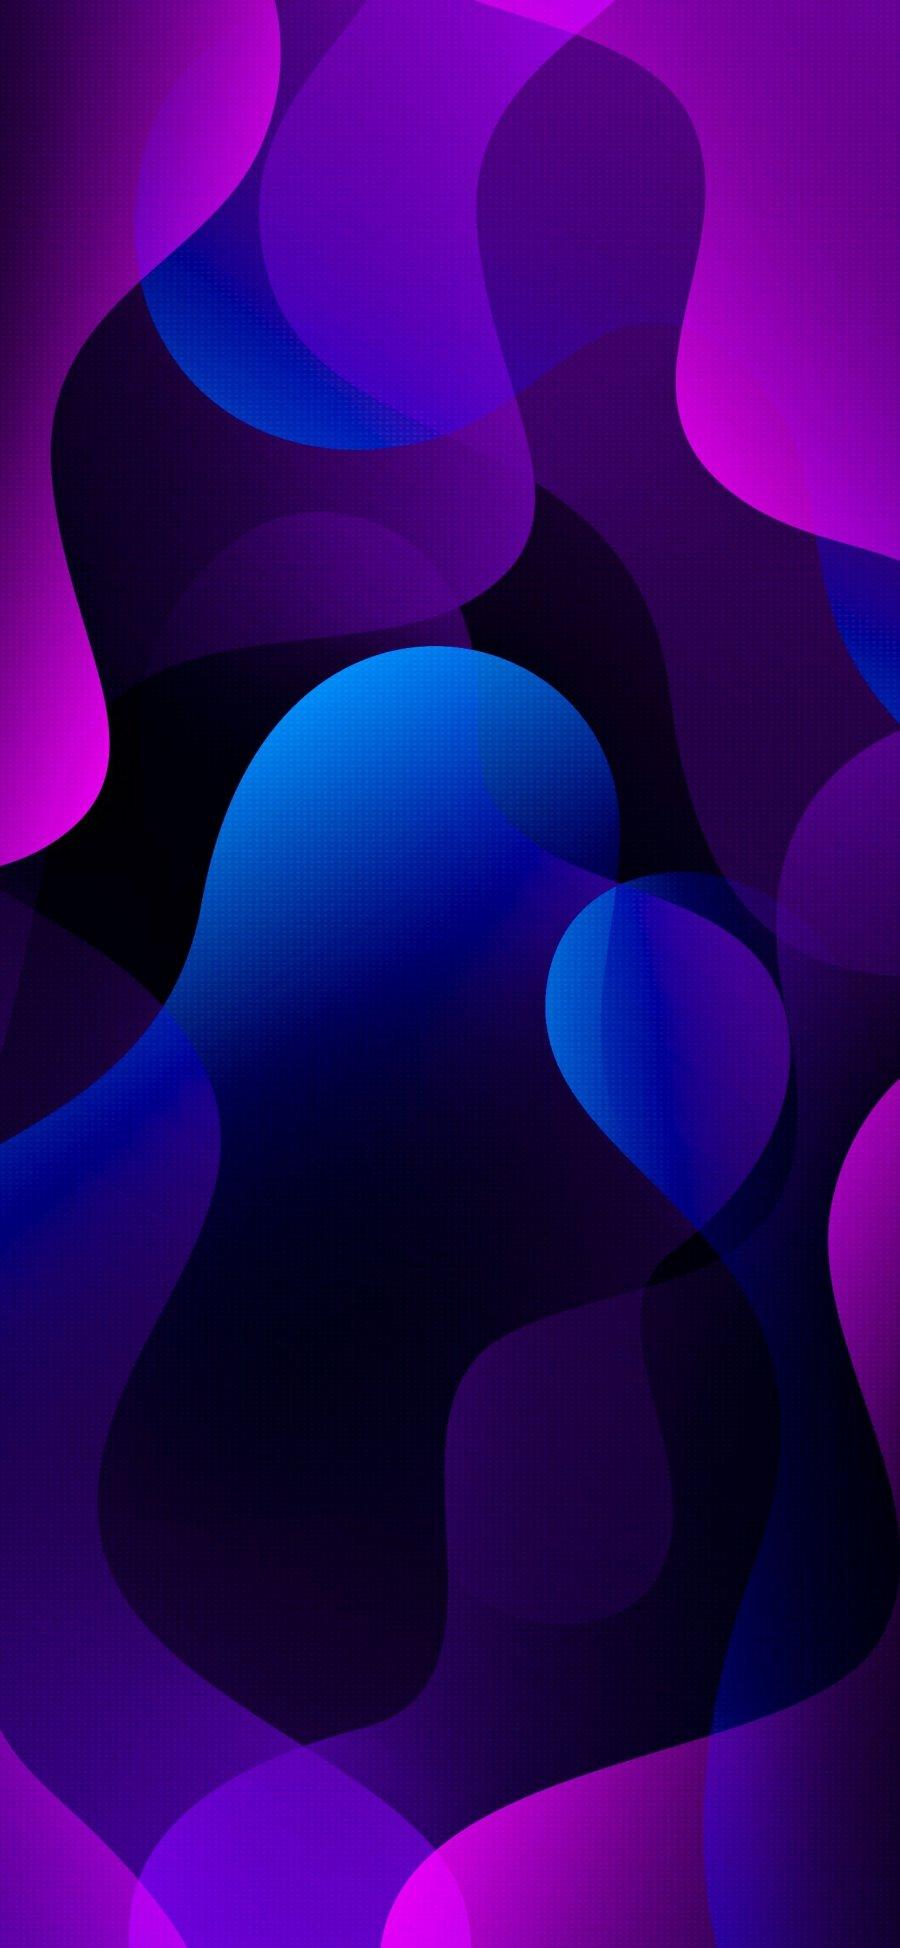 Gradient Colors iPhone Wallpaper